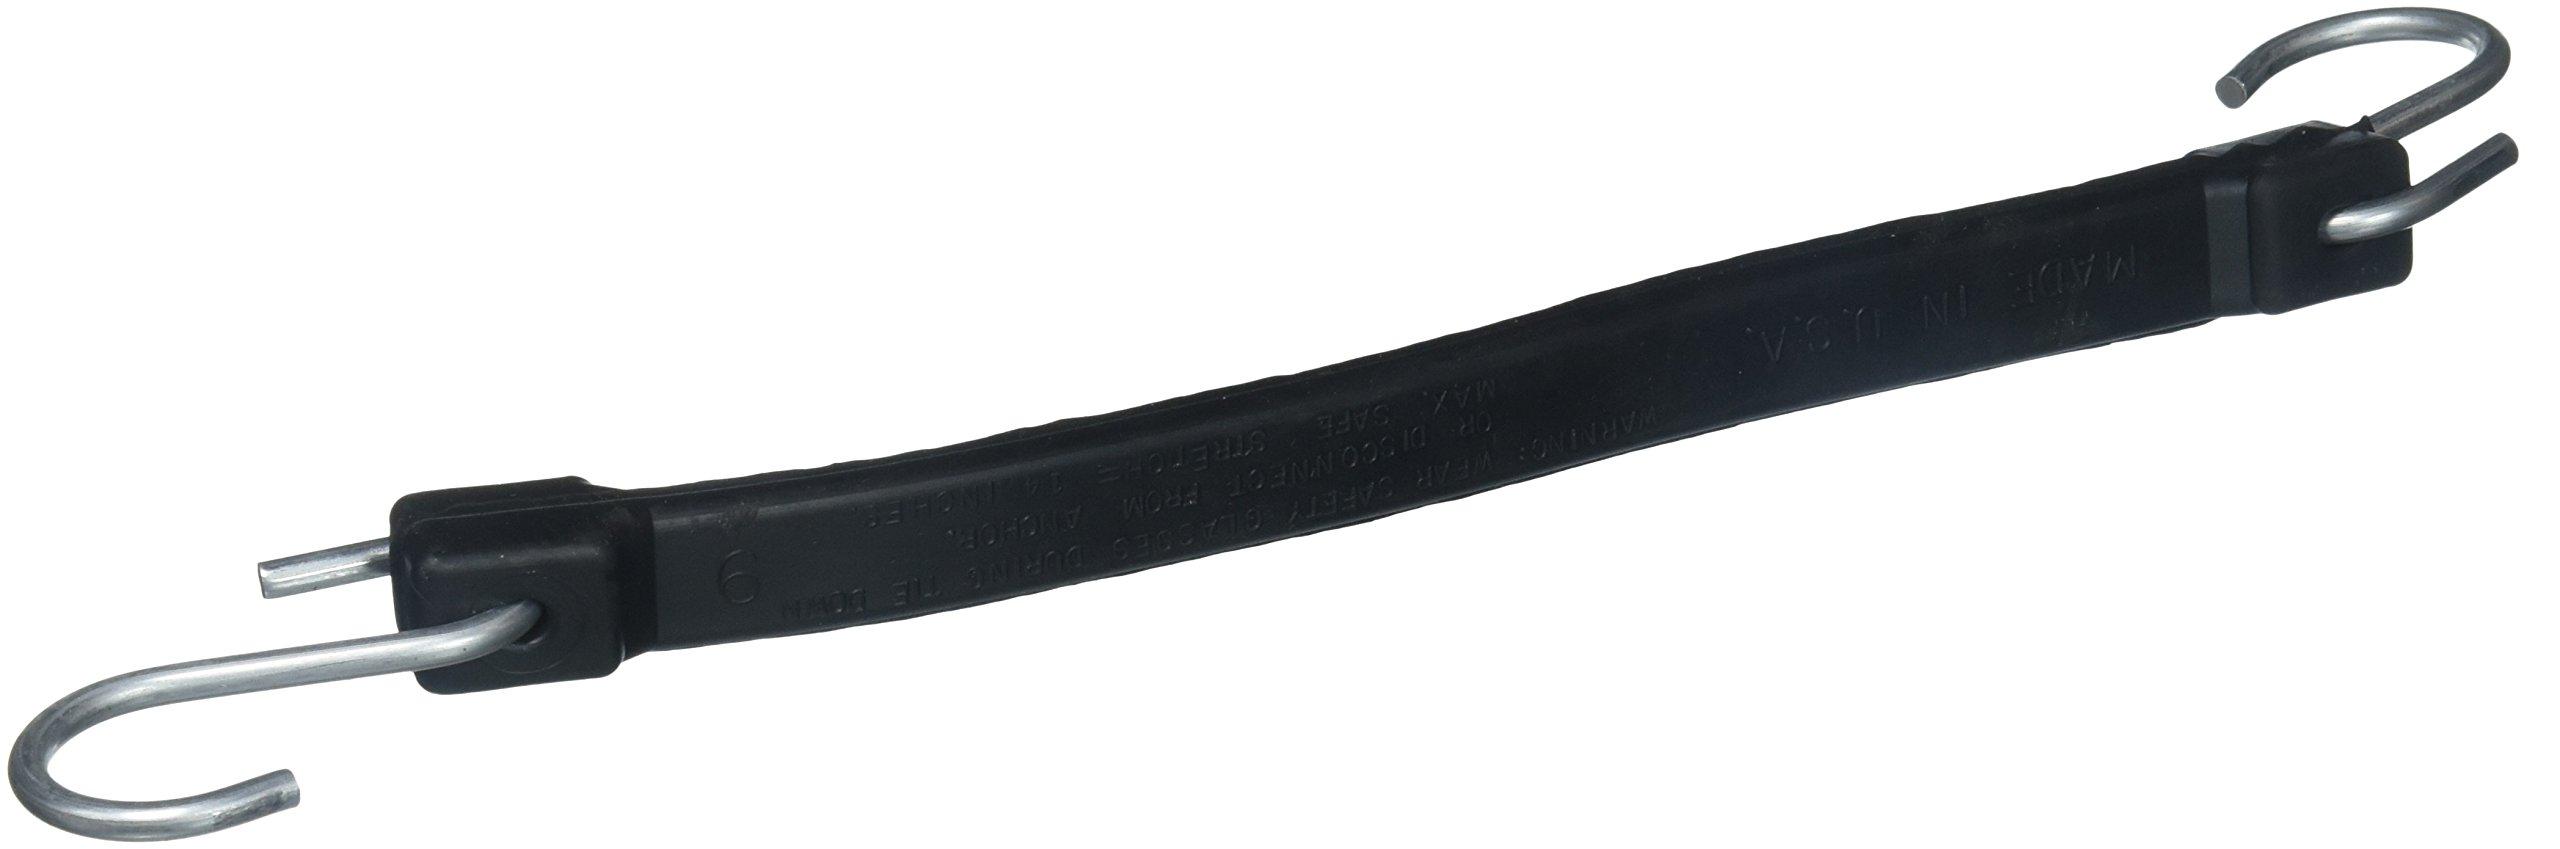 Bon 84-479 9-Inch Length Rubber Tie Straps, 10-Pack